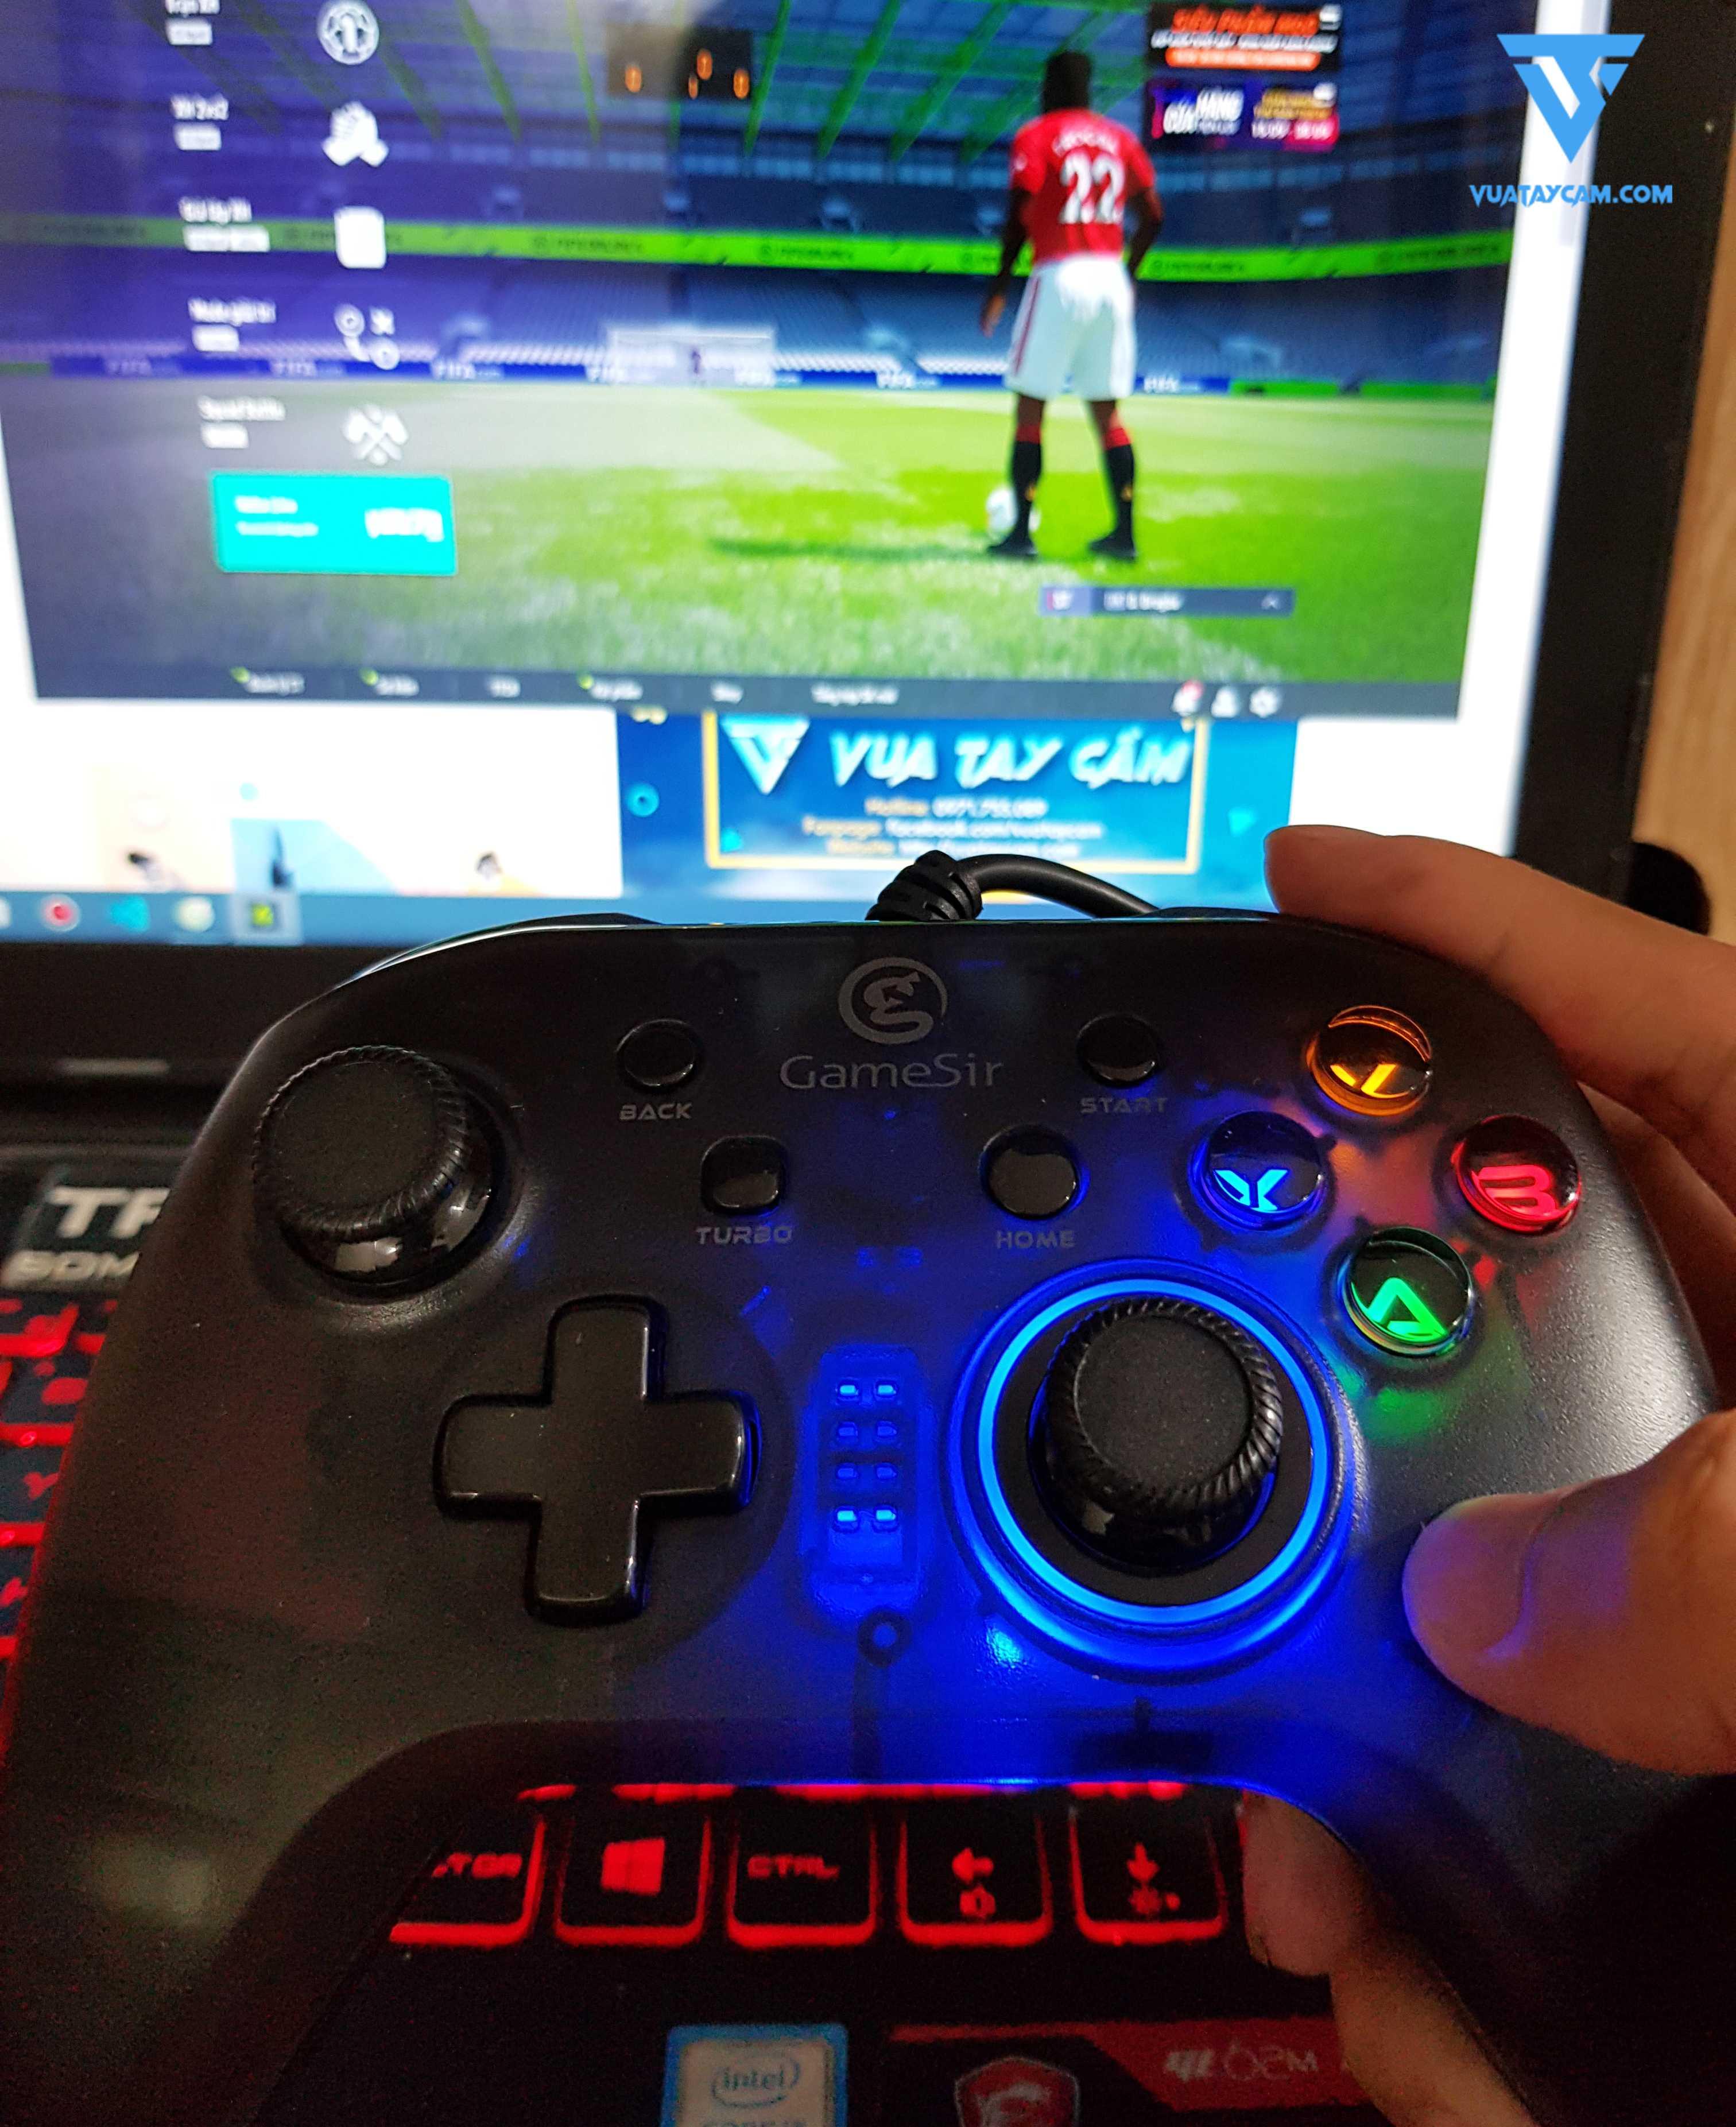 https://api.vuataycam.com/file/1602090365716-611677036-tay-cam-choi-game-gamesir-t4w-2.jpg